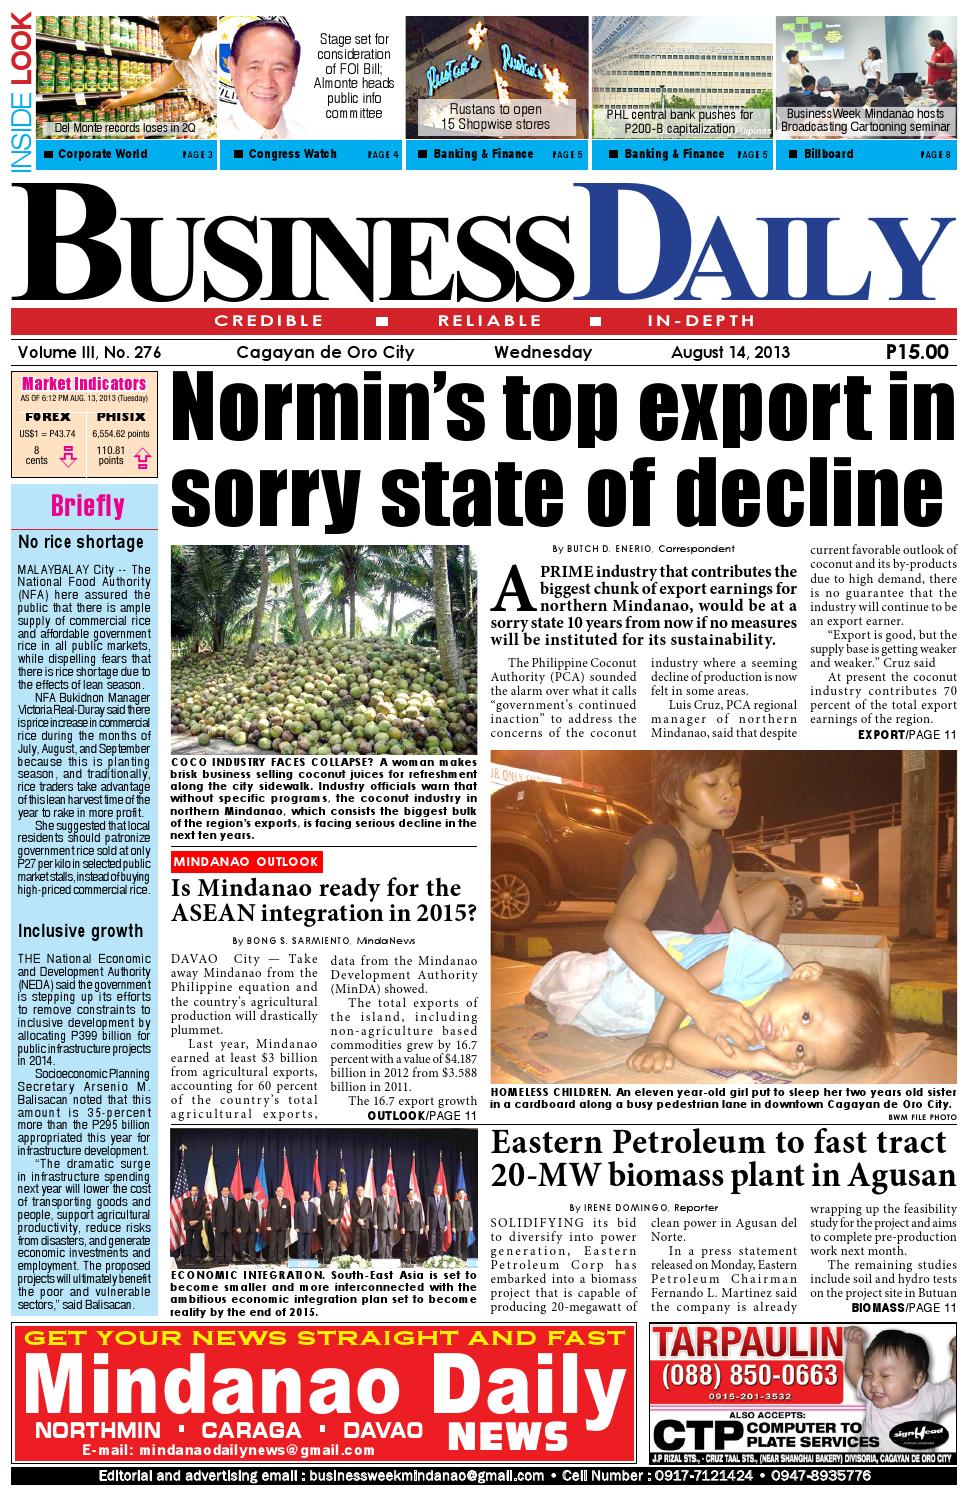 BusinessDaily (August 14, 2013) by Mindanao Daily News - issuu